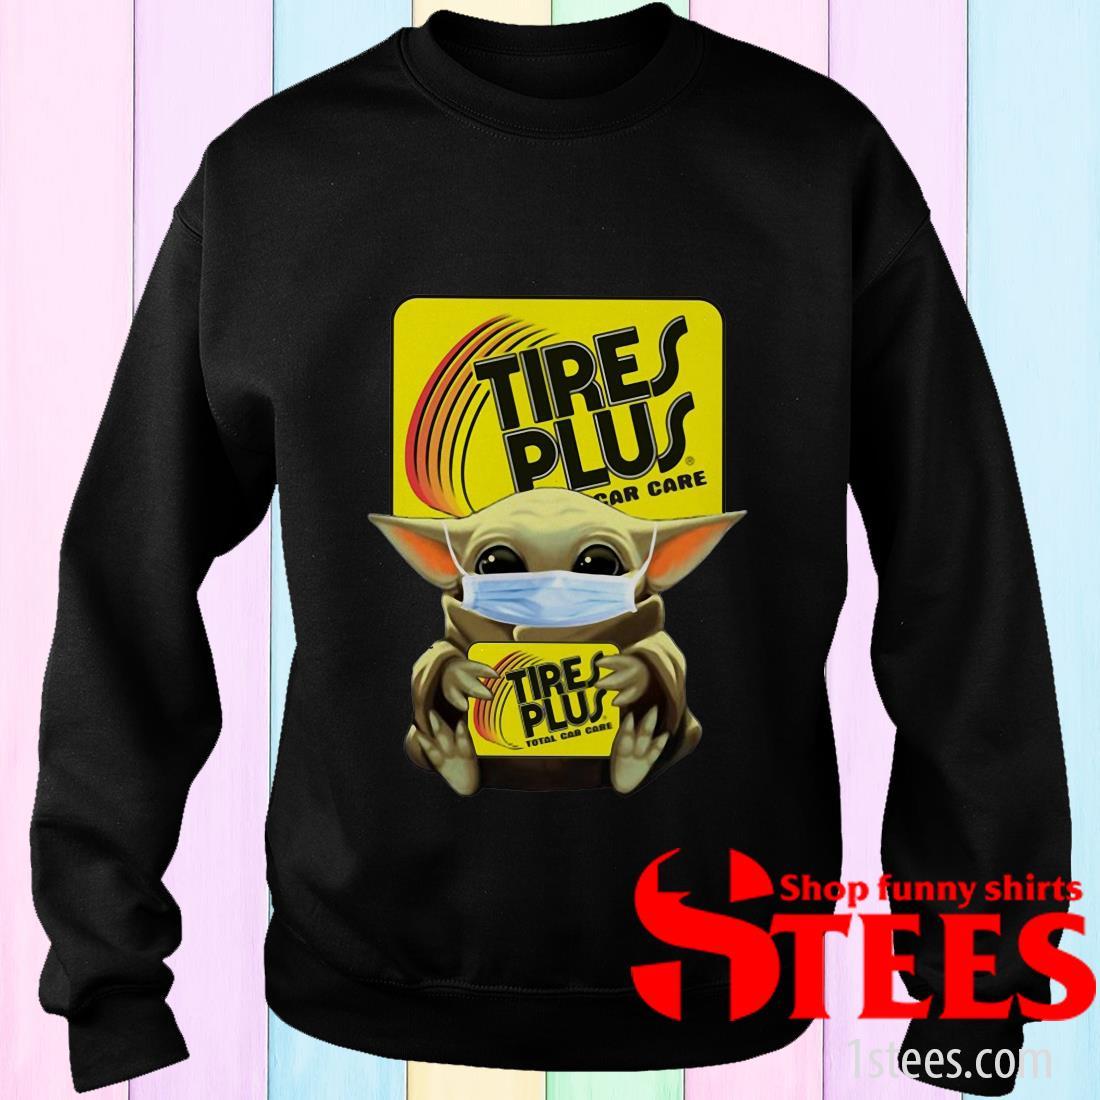 Star Wars Baby Yoda Hug Tires Plus Total Car Care Covid-19 Sweater